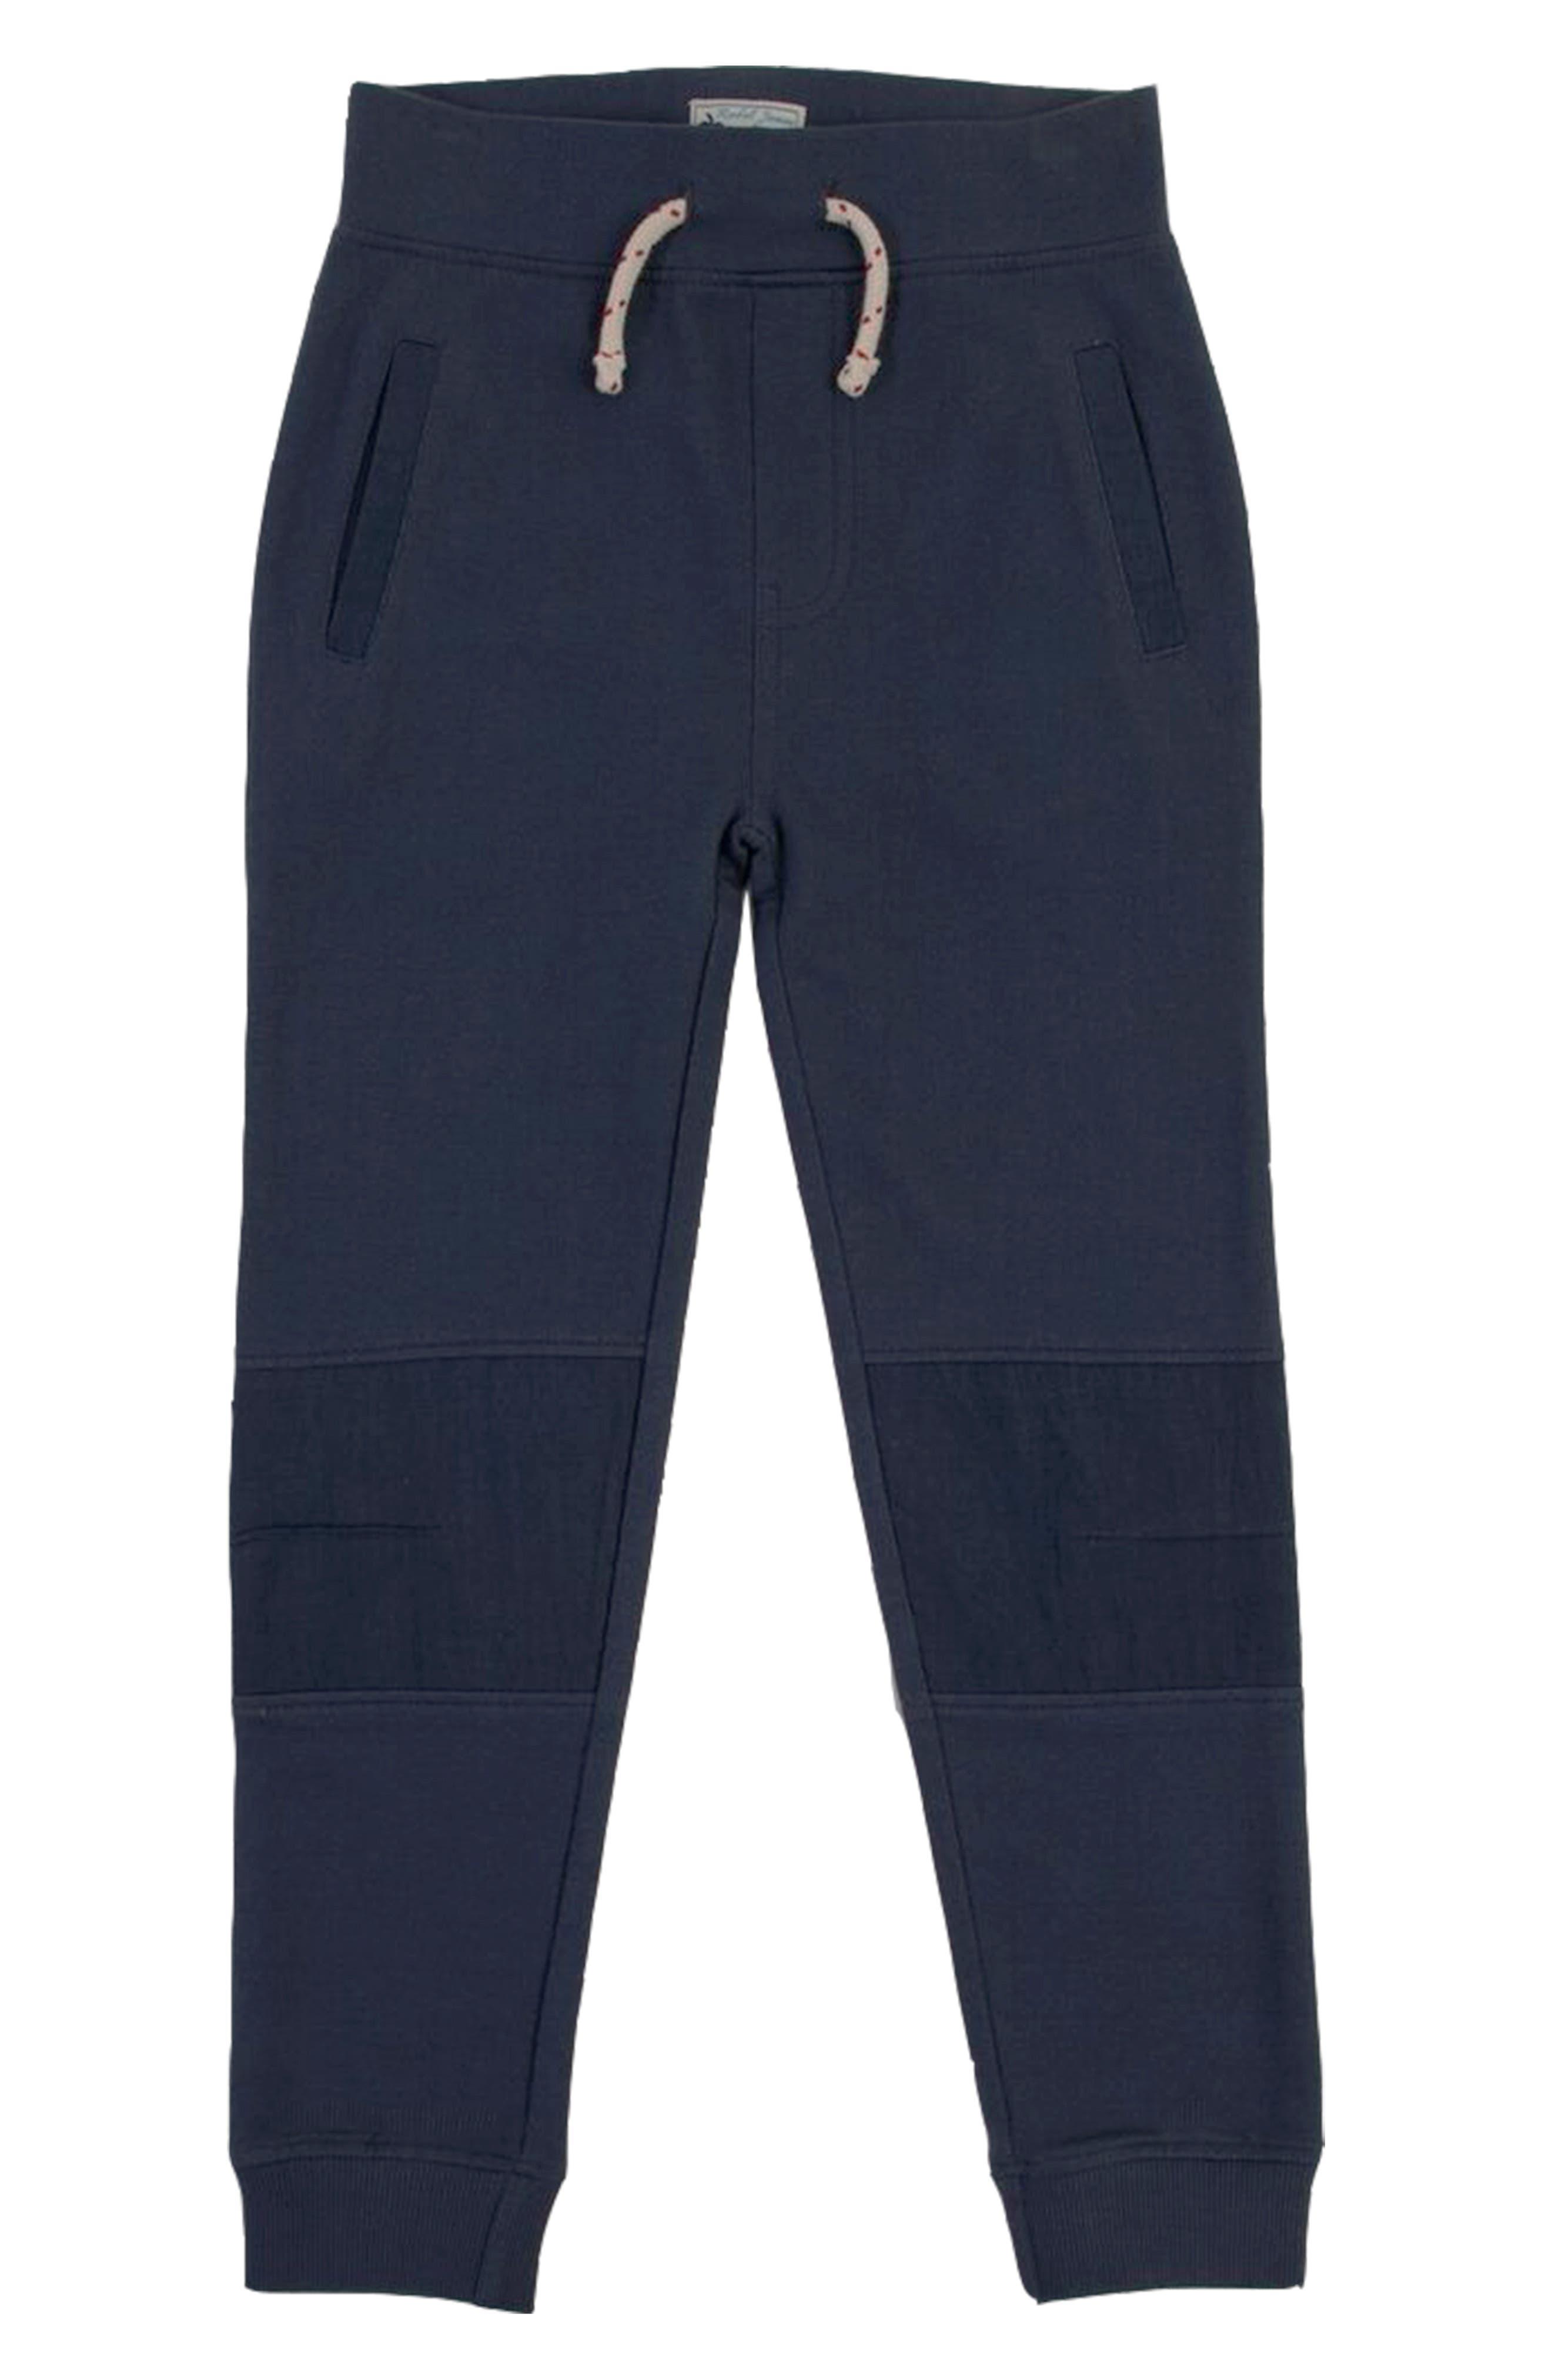 Boys Rebel James  Charli Tapered Sweatpants